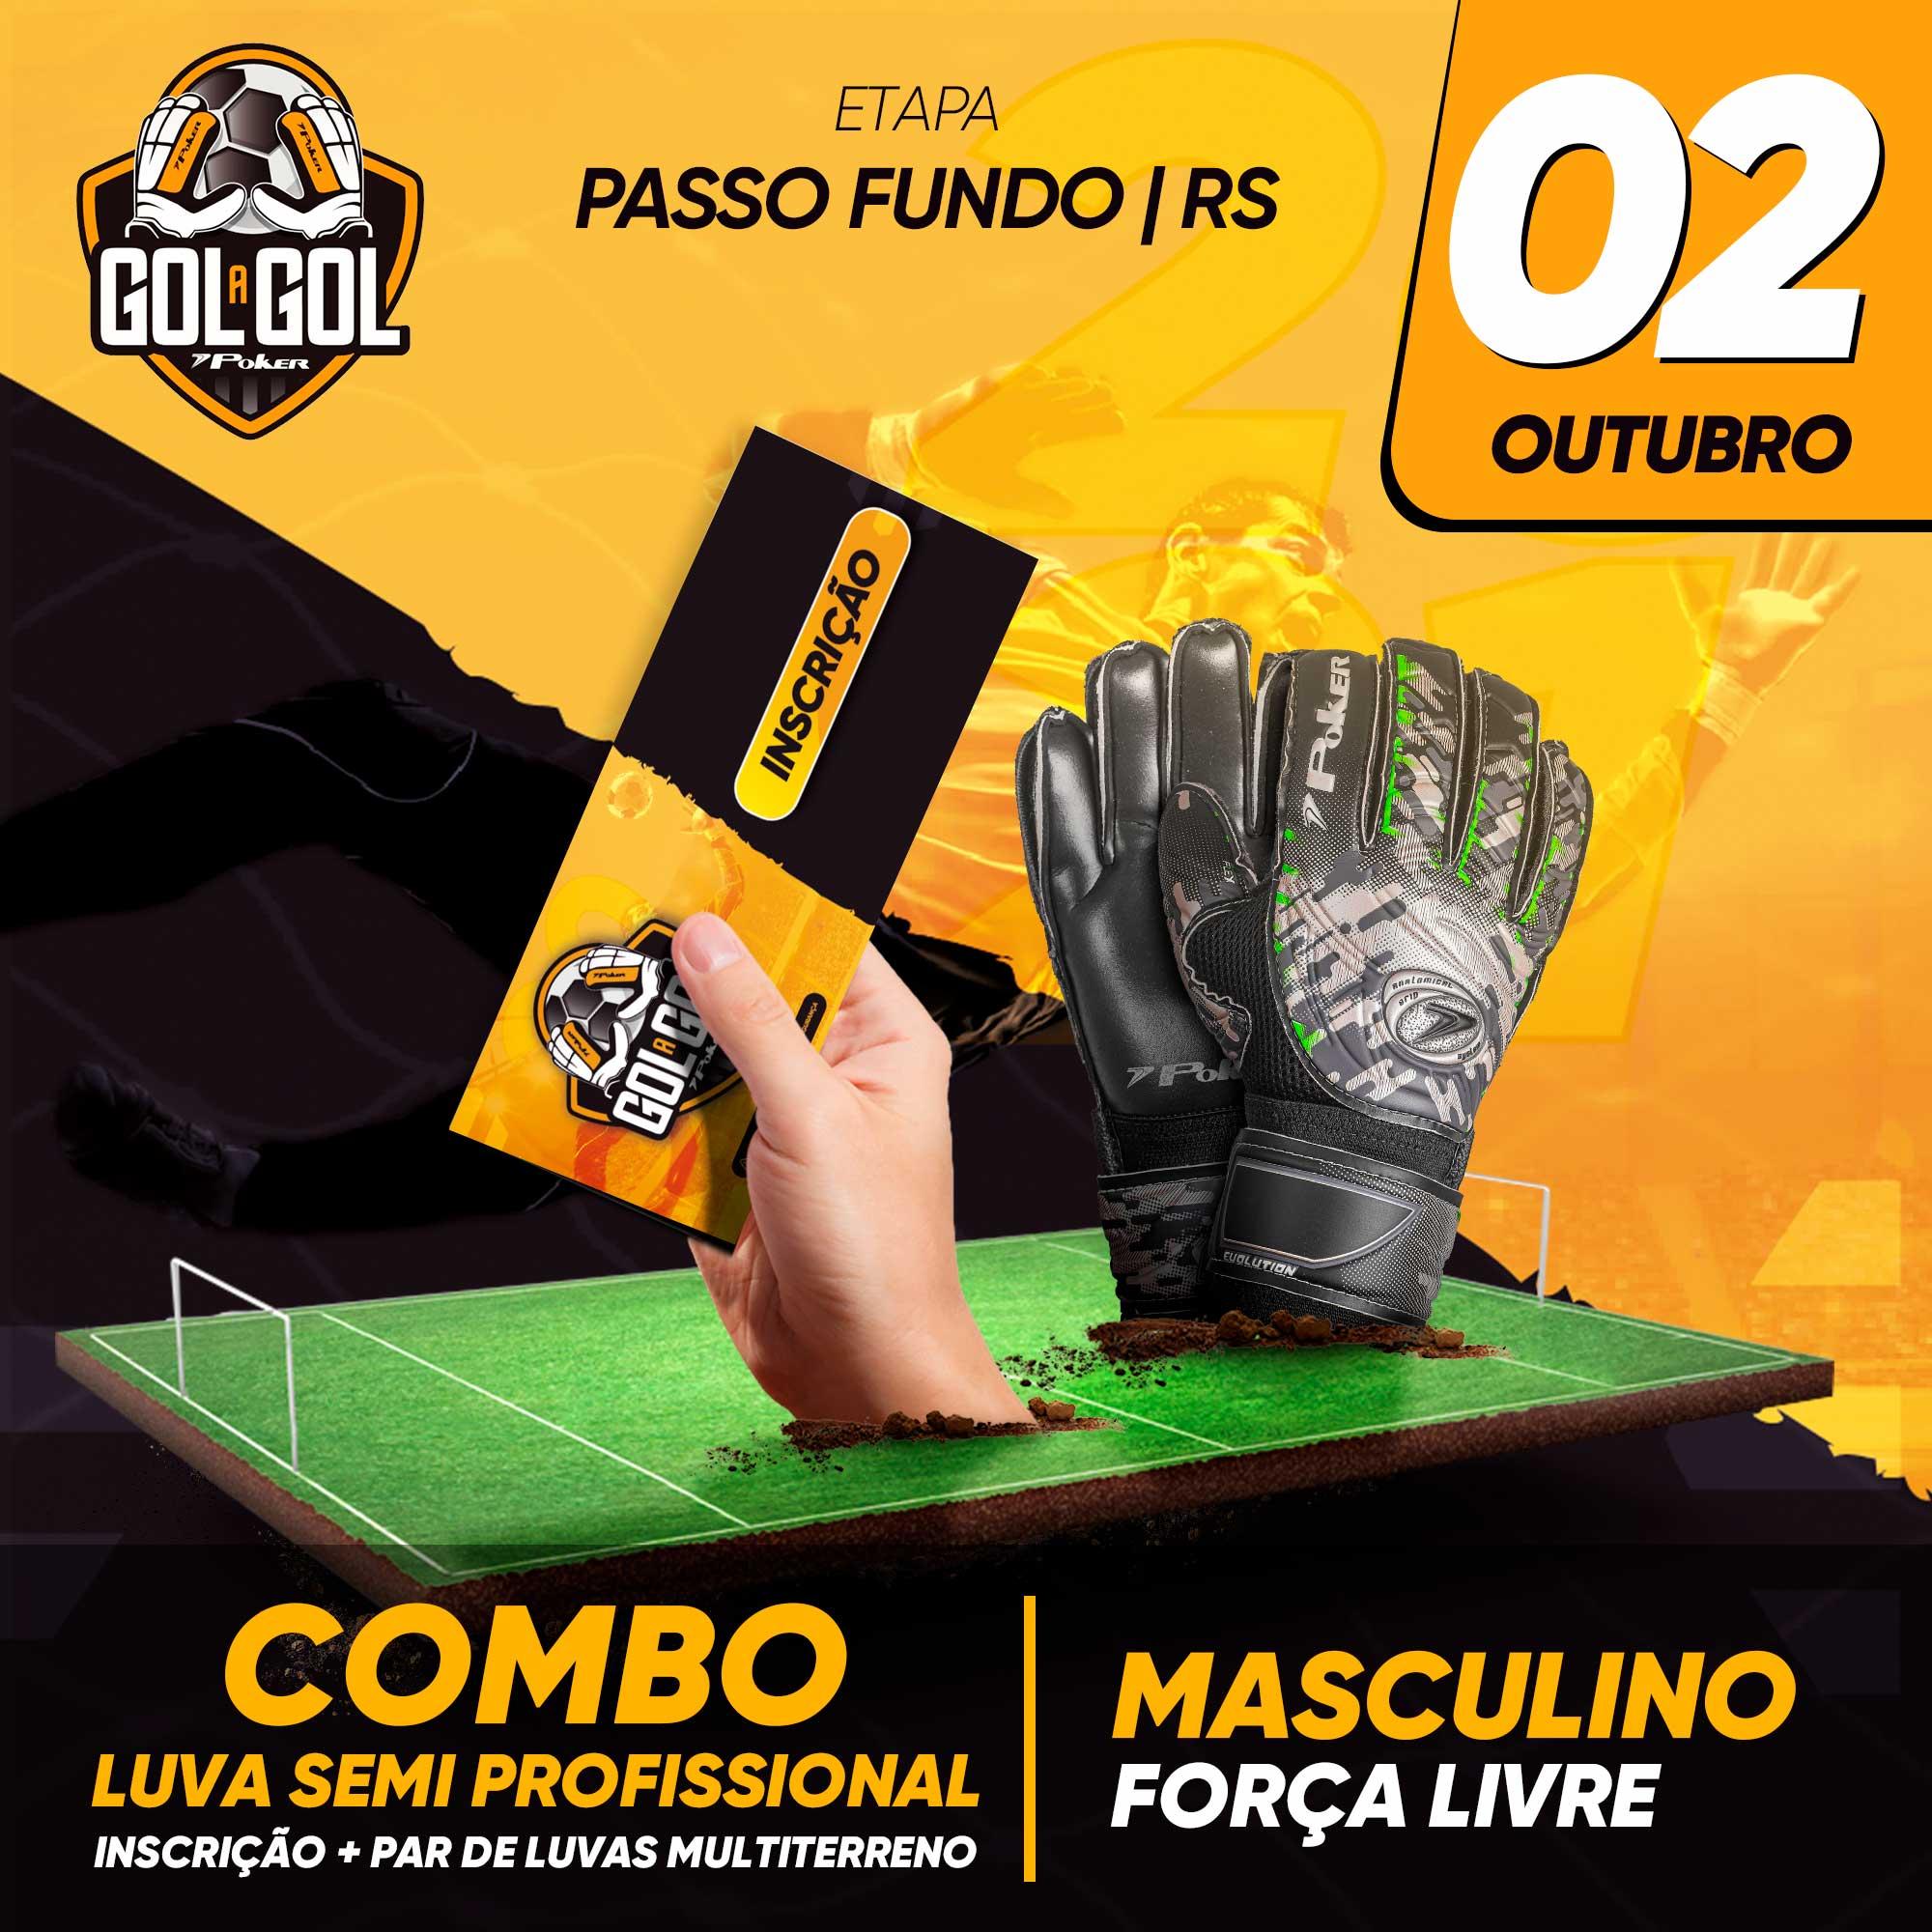 Combo Luva Semi-Profissional   Gol a Gol Passo Fundo/RS  02/10/2021